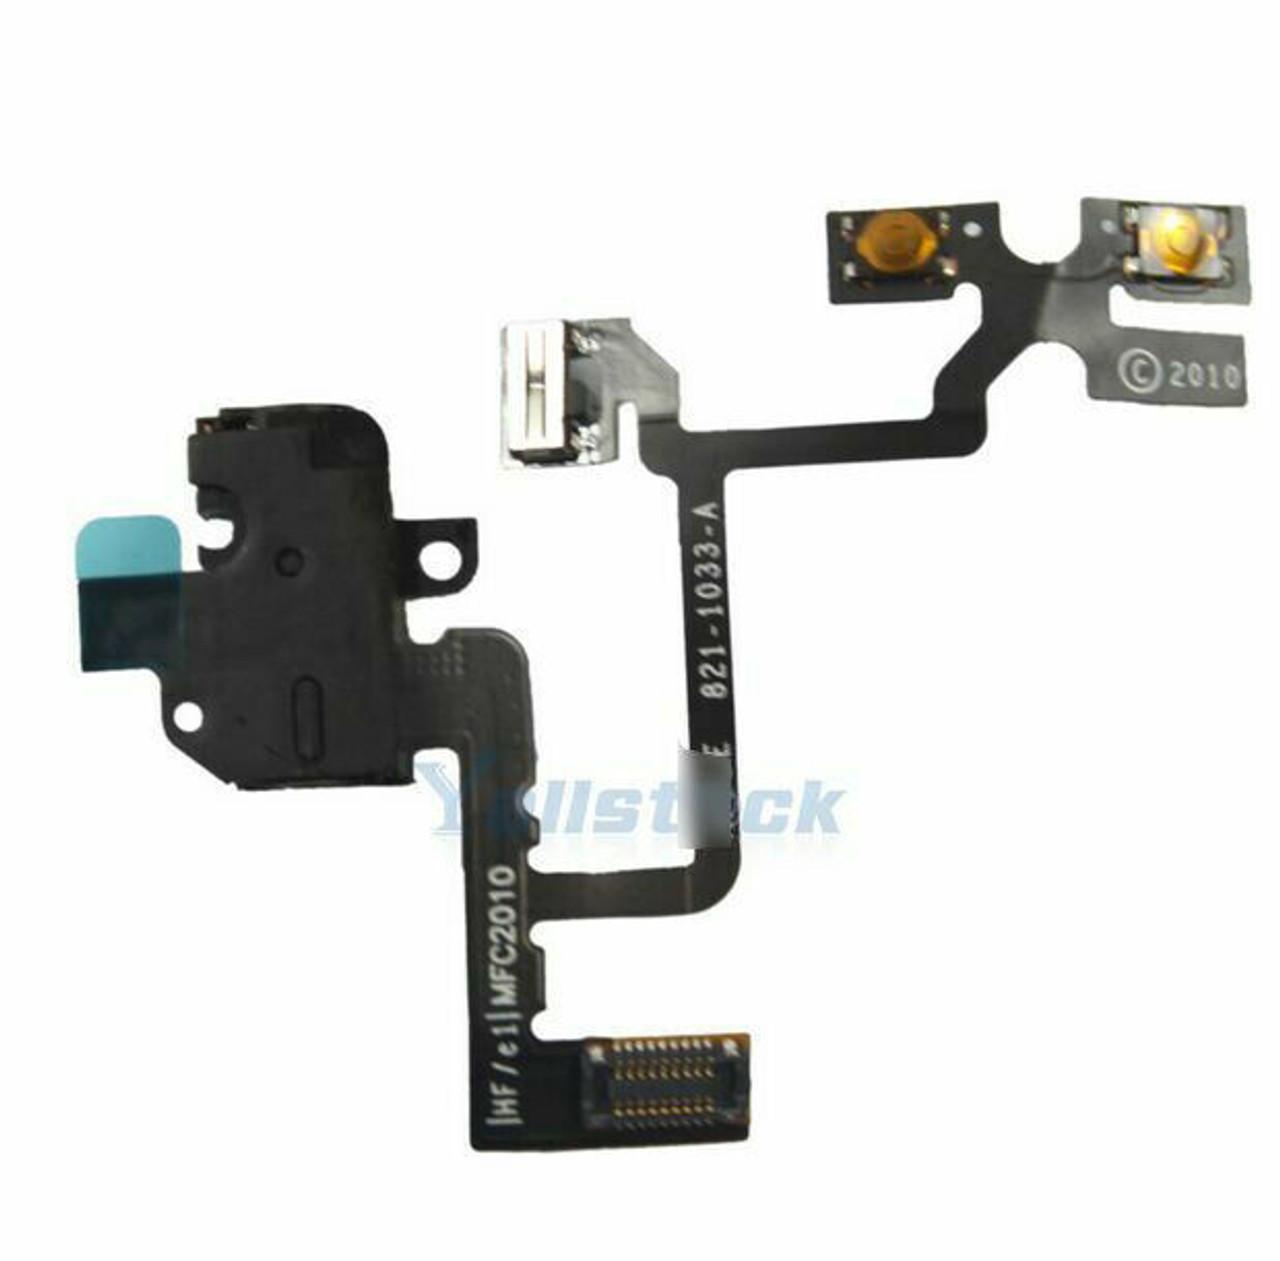 OEM SPEC Black Headphone Audio Jack Volume Switch Flex Cable For iPhone 4 4G GSM